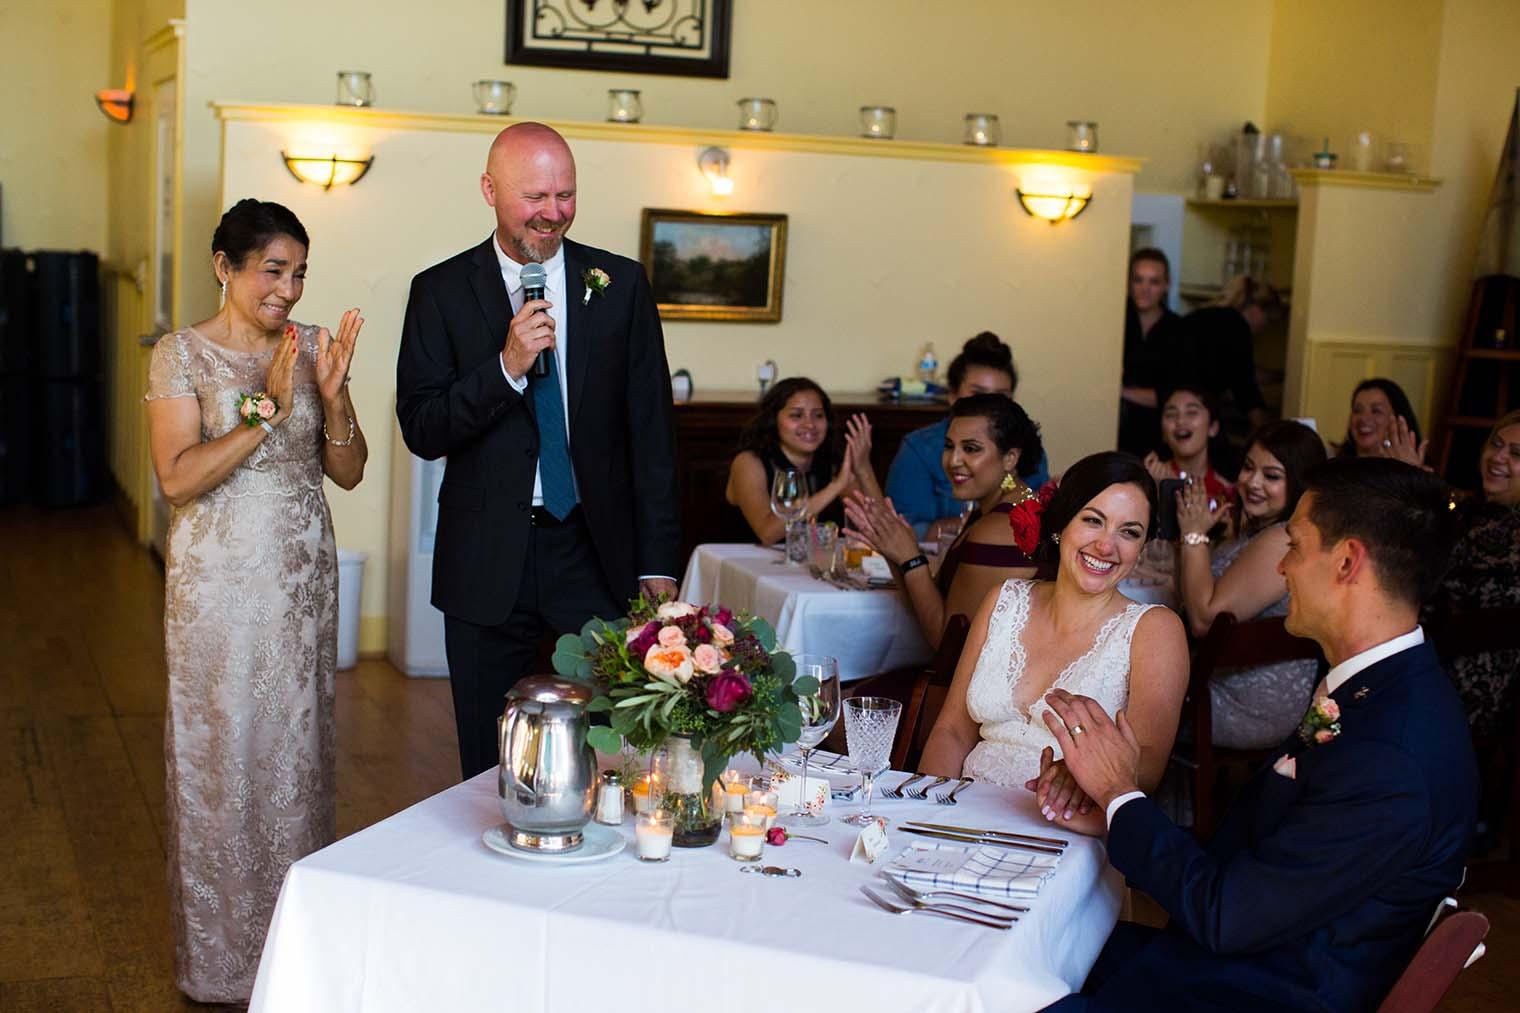 wedding toasts at Highland Dell Lodge